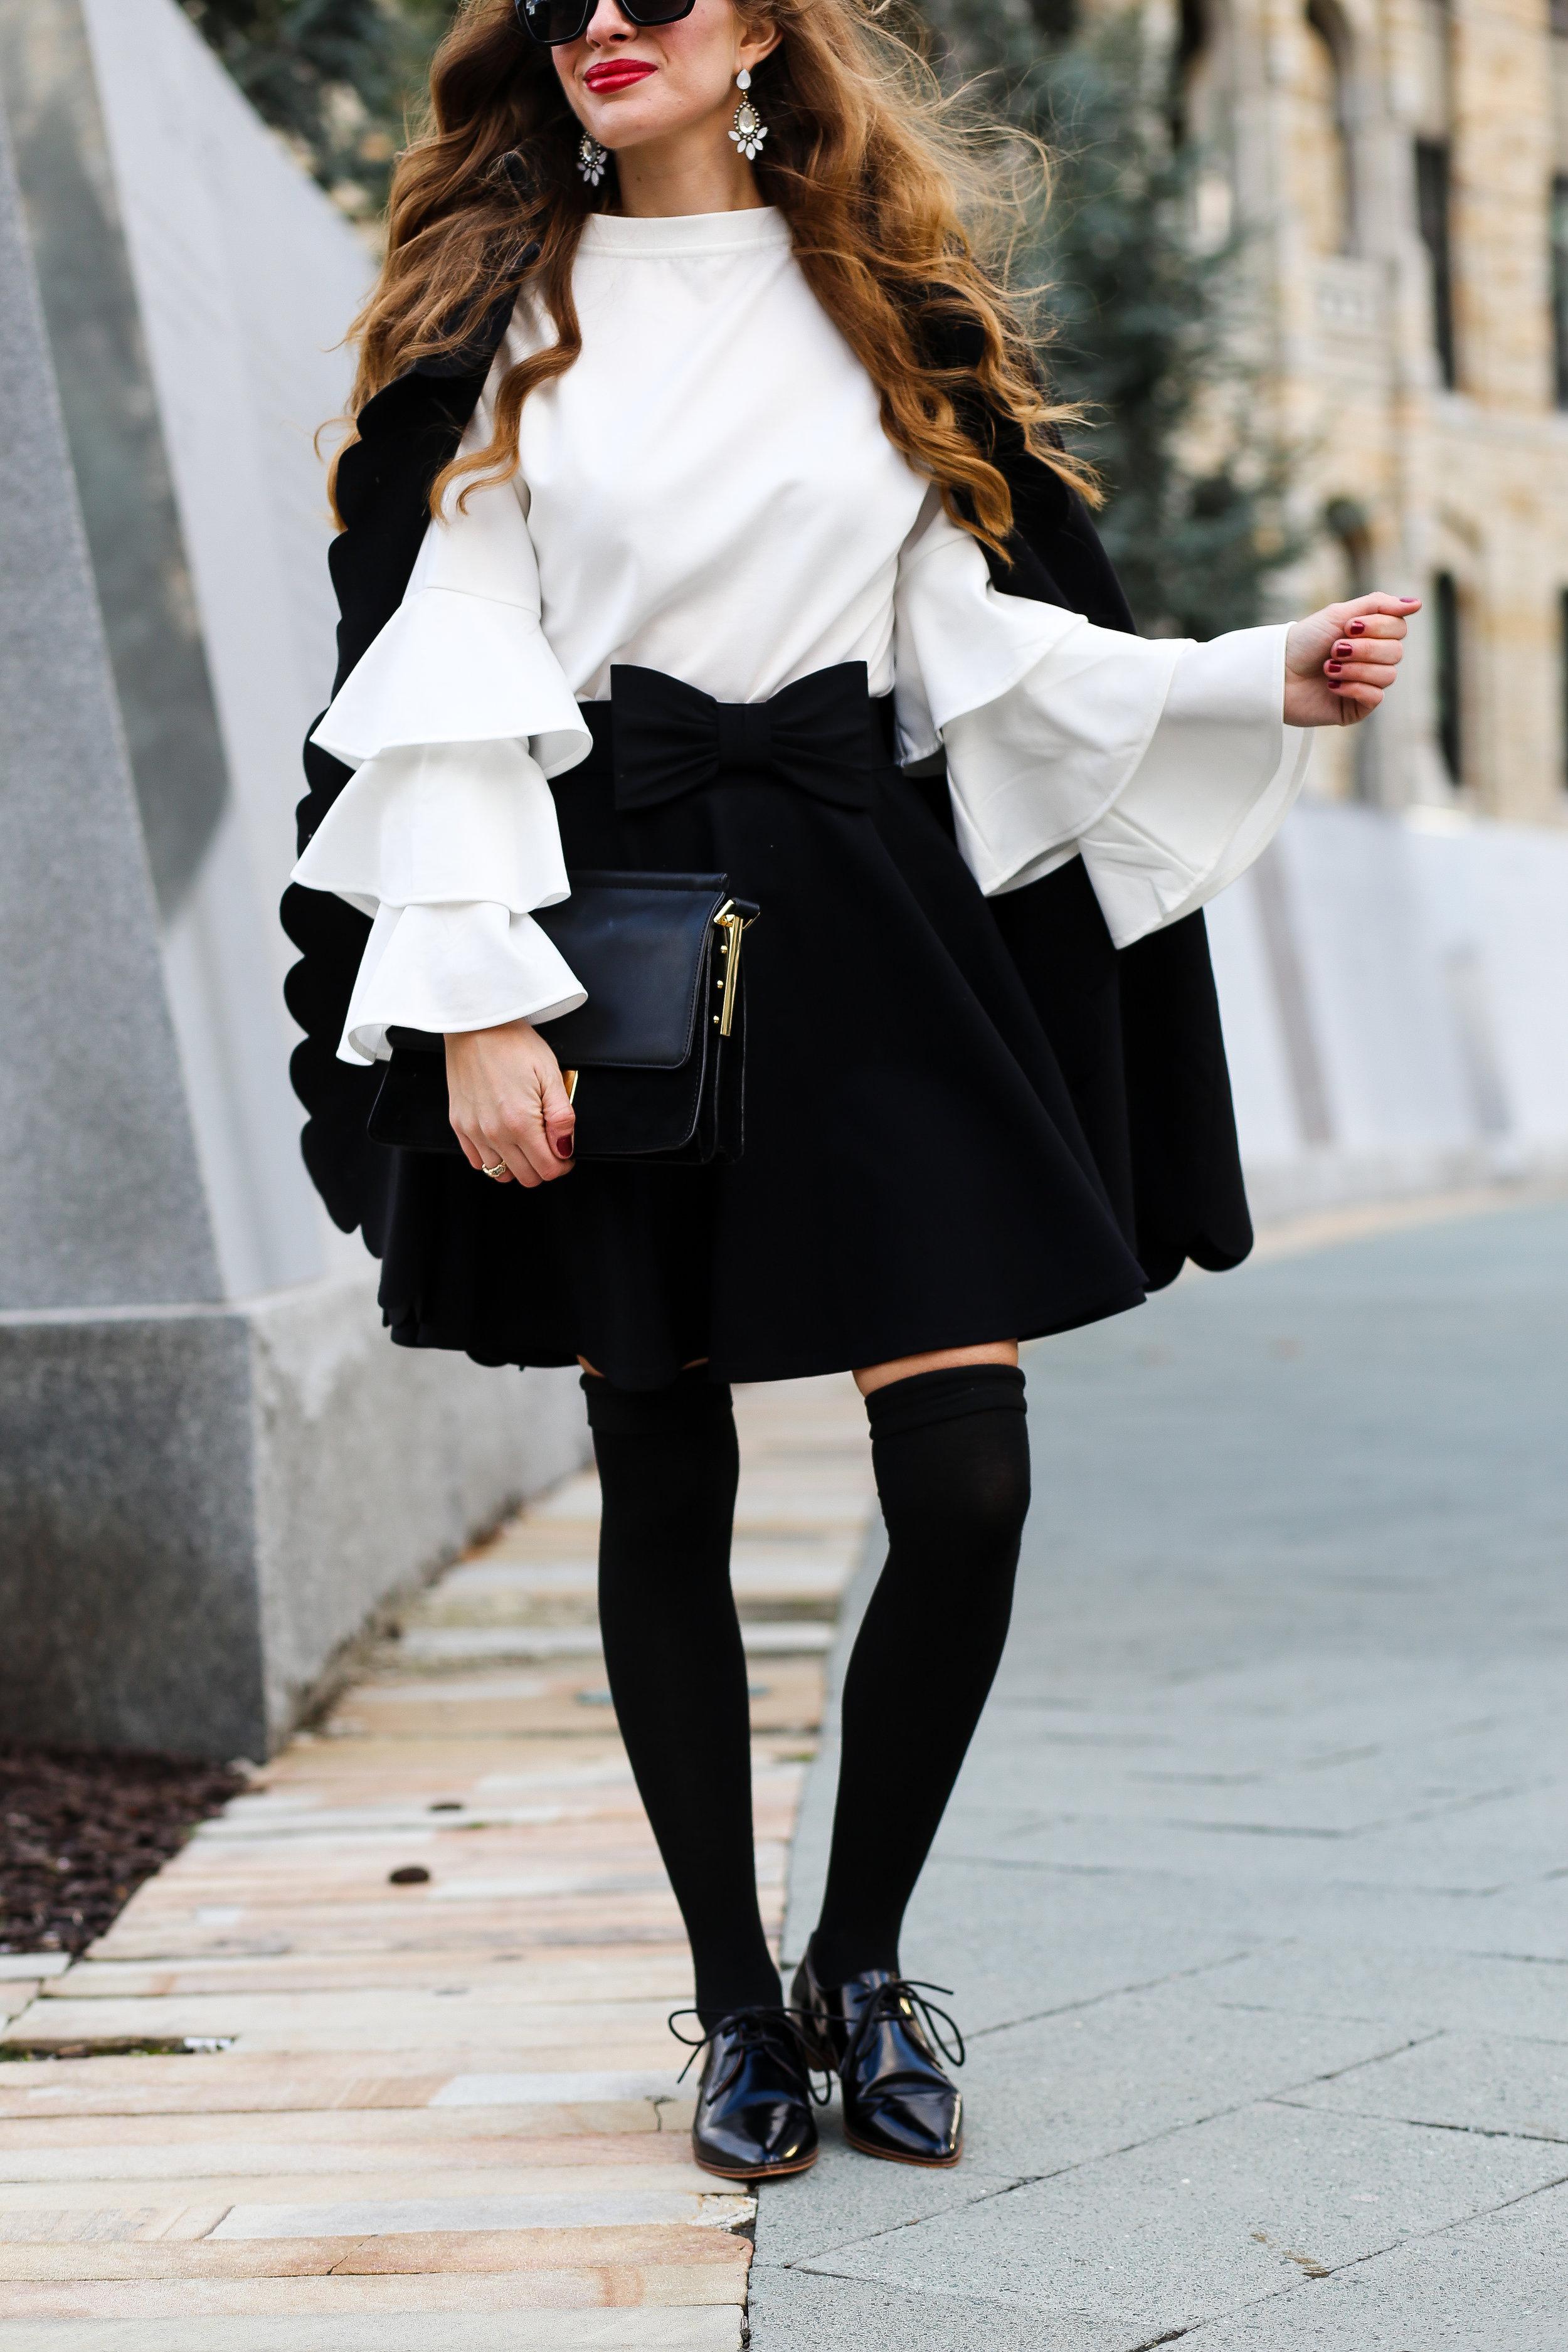 Bell Sleeves & Cape- Enchanting Elegance